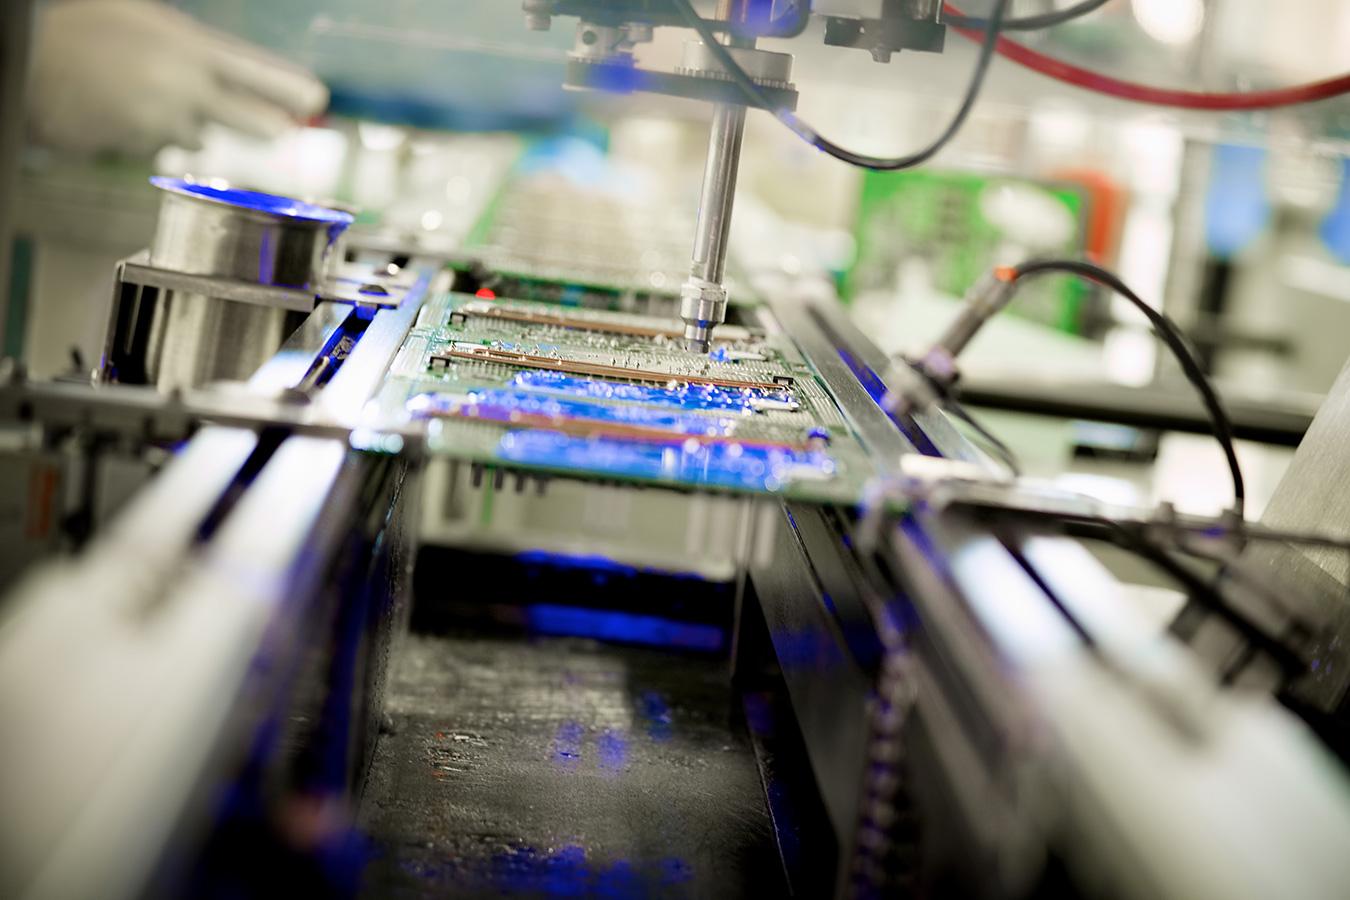 Conformal coating machine - Fujifilm XE-1, XF55-200mm @ 58mm, ISO 1250, f/3.5, 1/18.